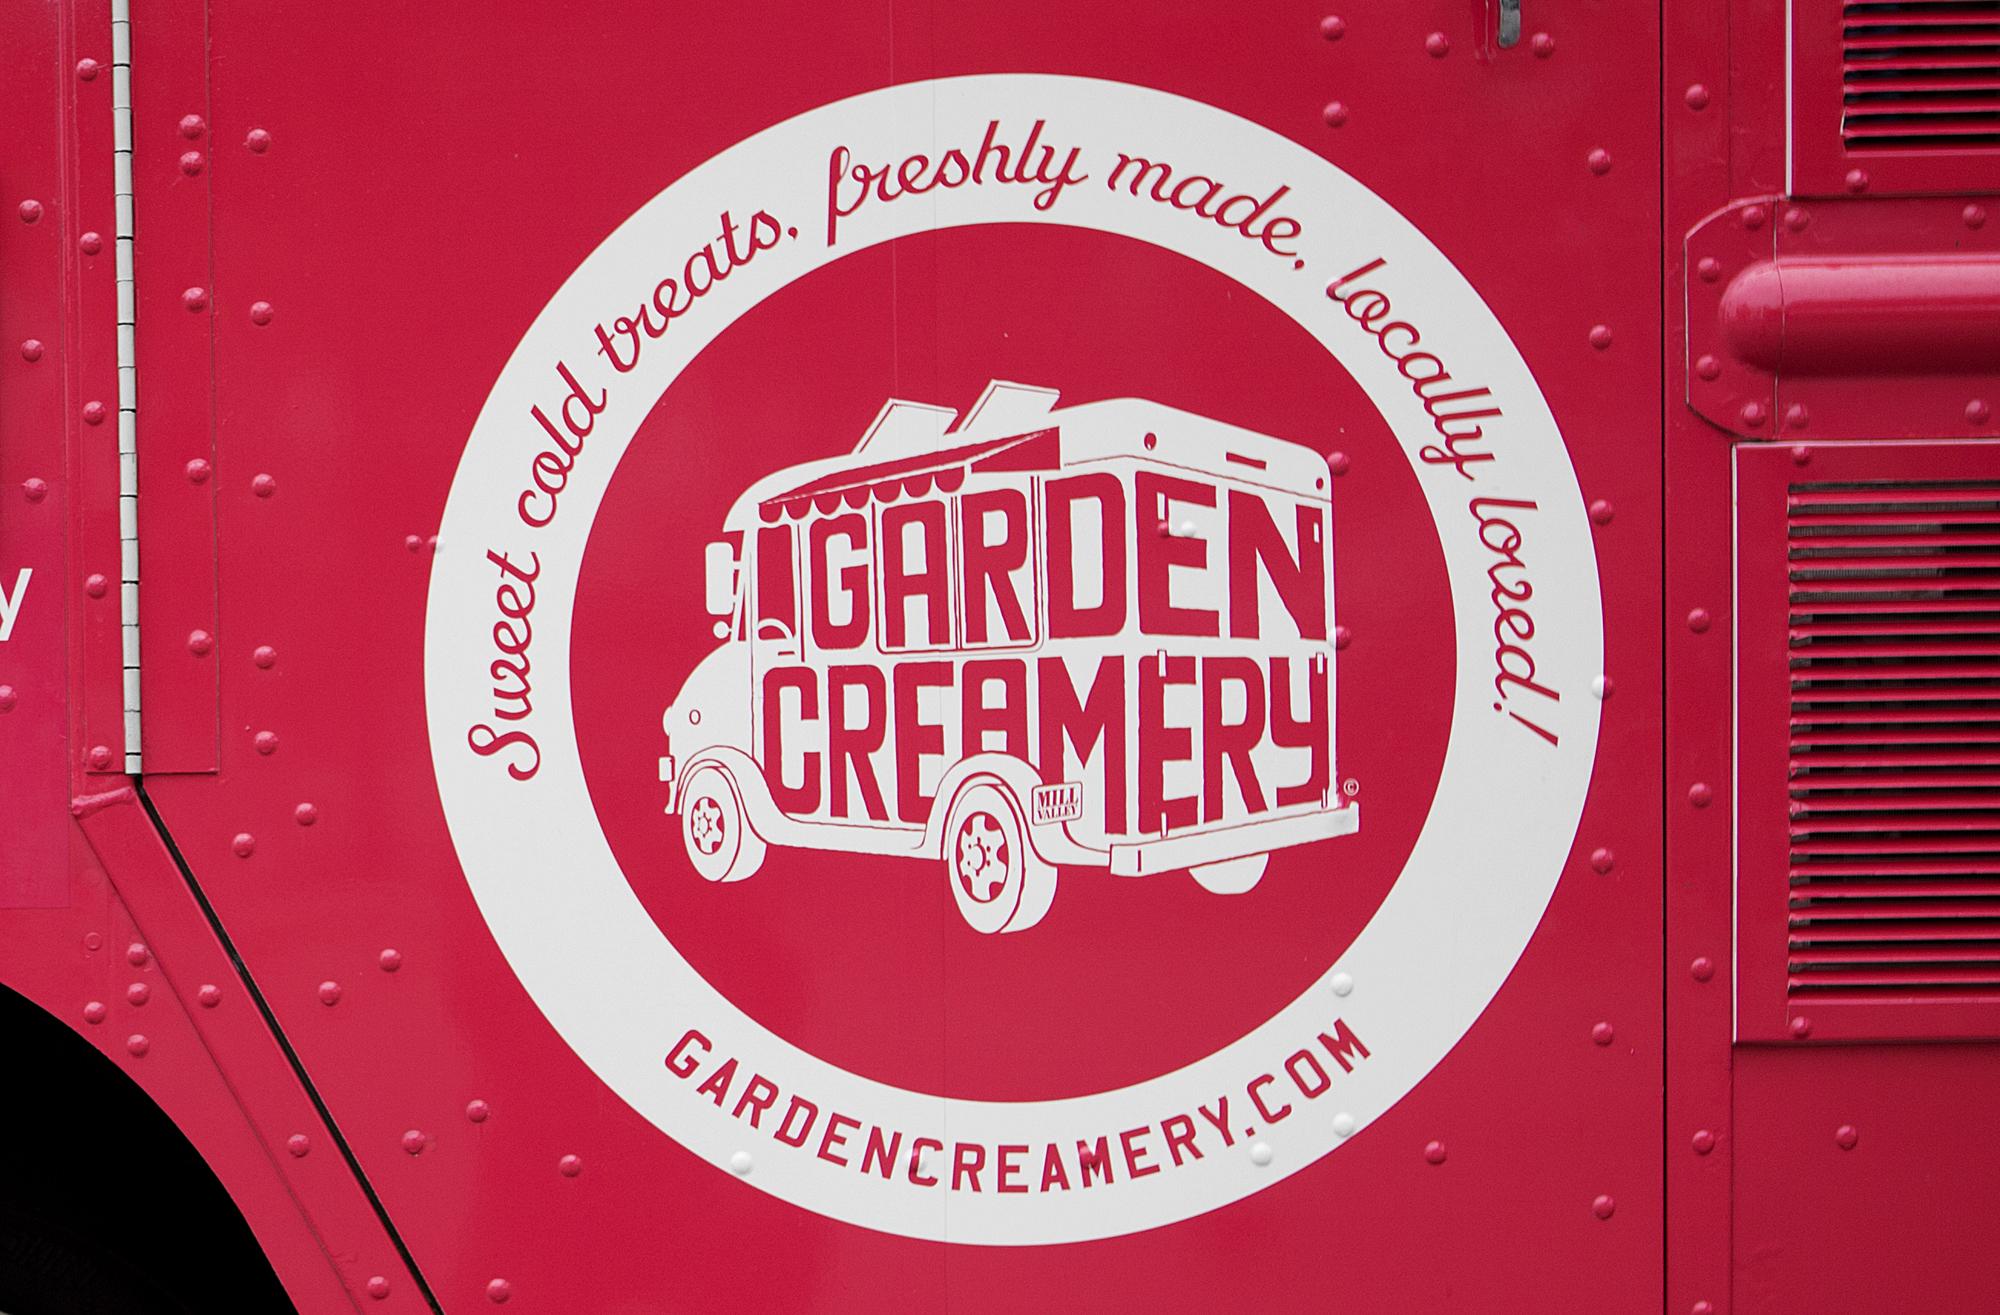 Garden Creamery mobile ice cream truck logo in pink and white